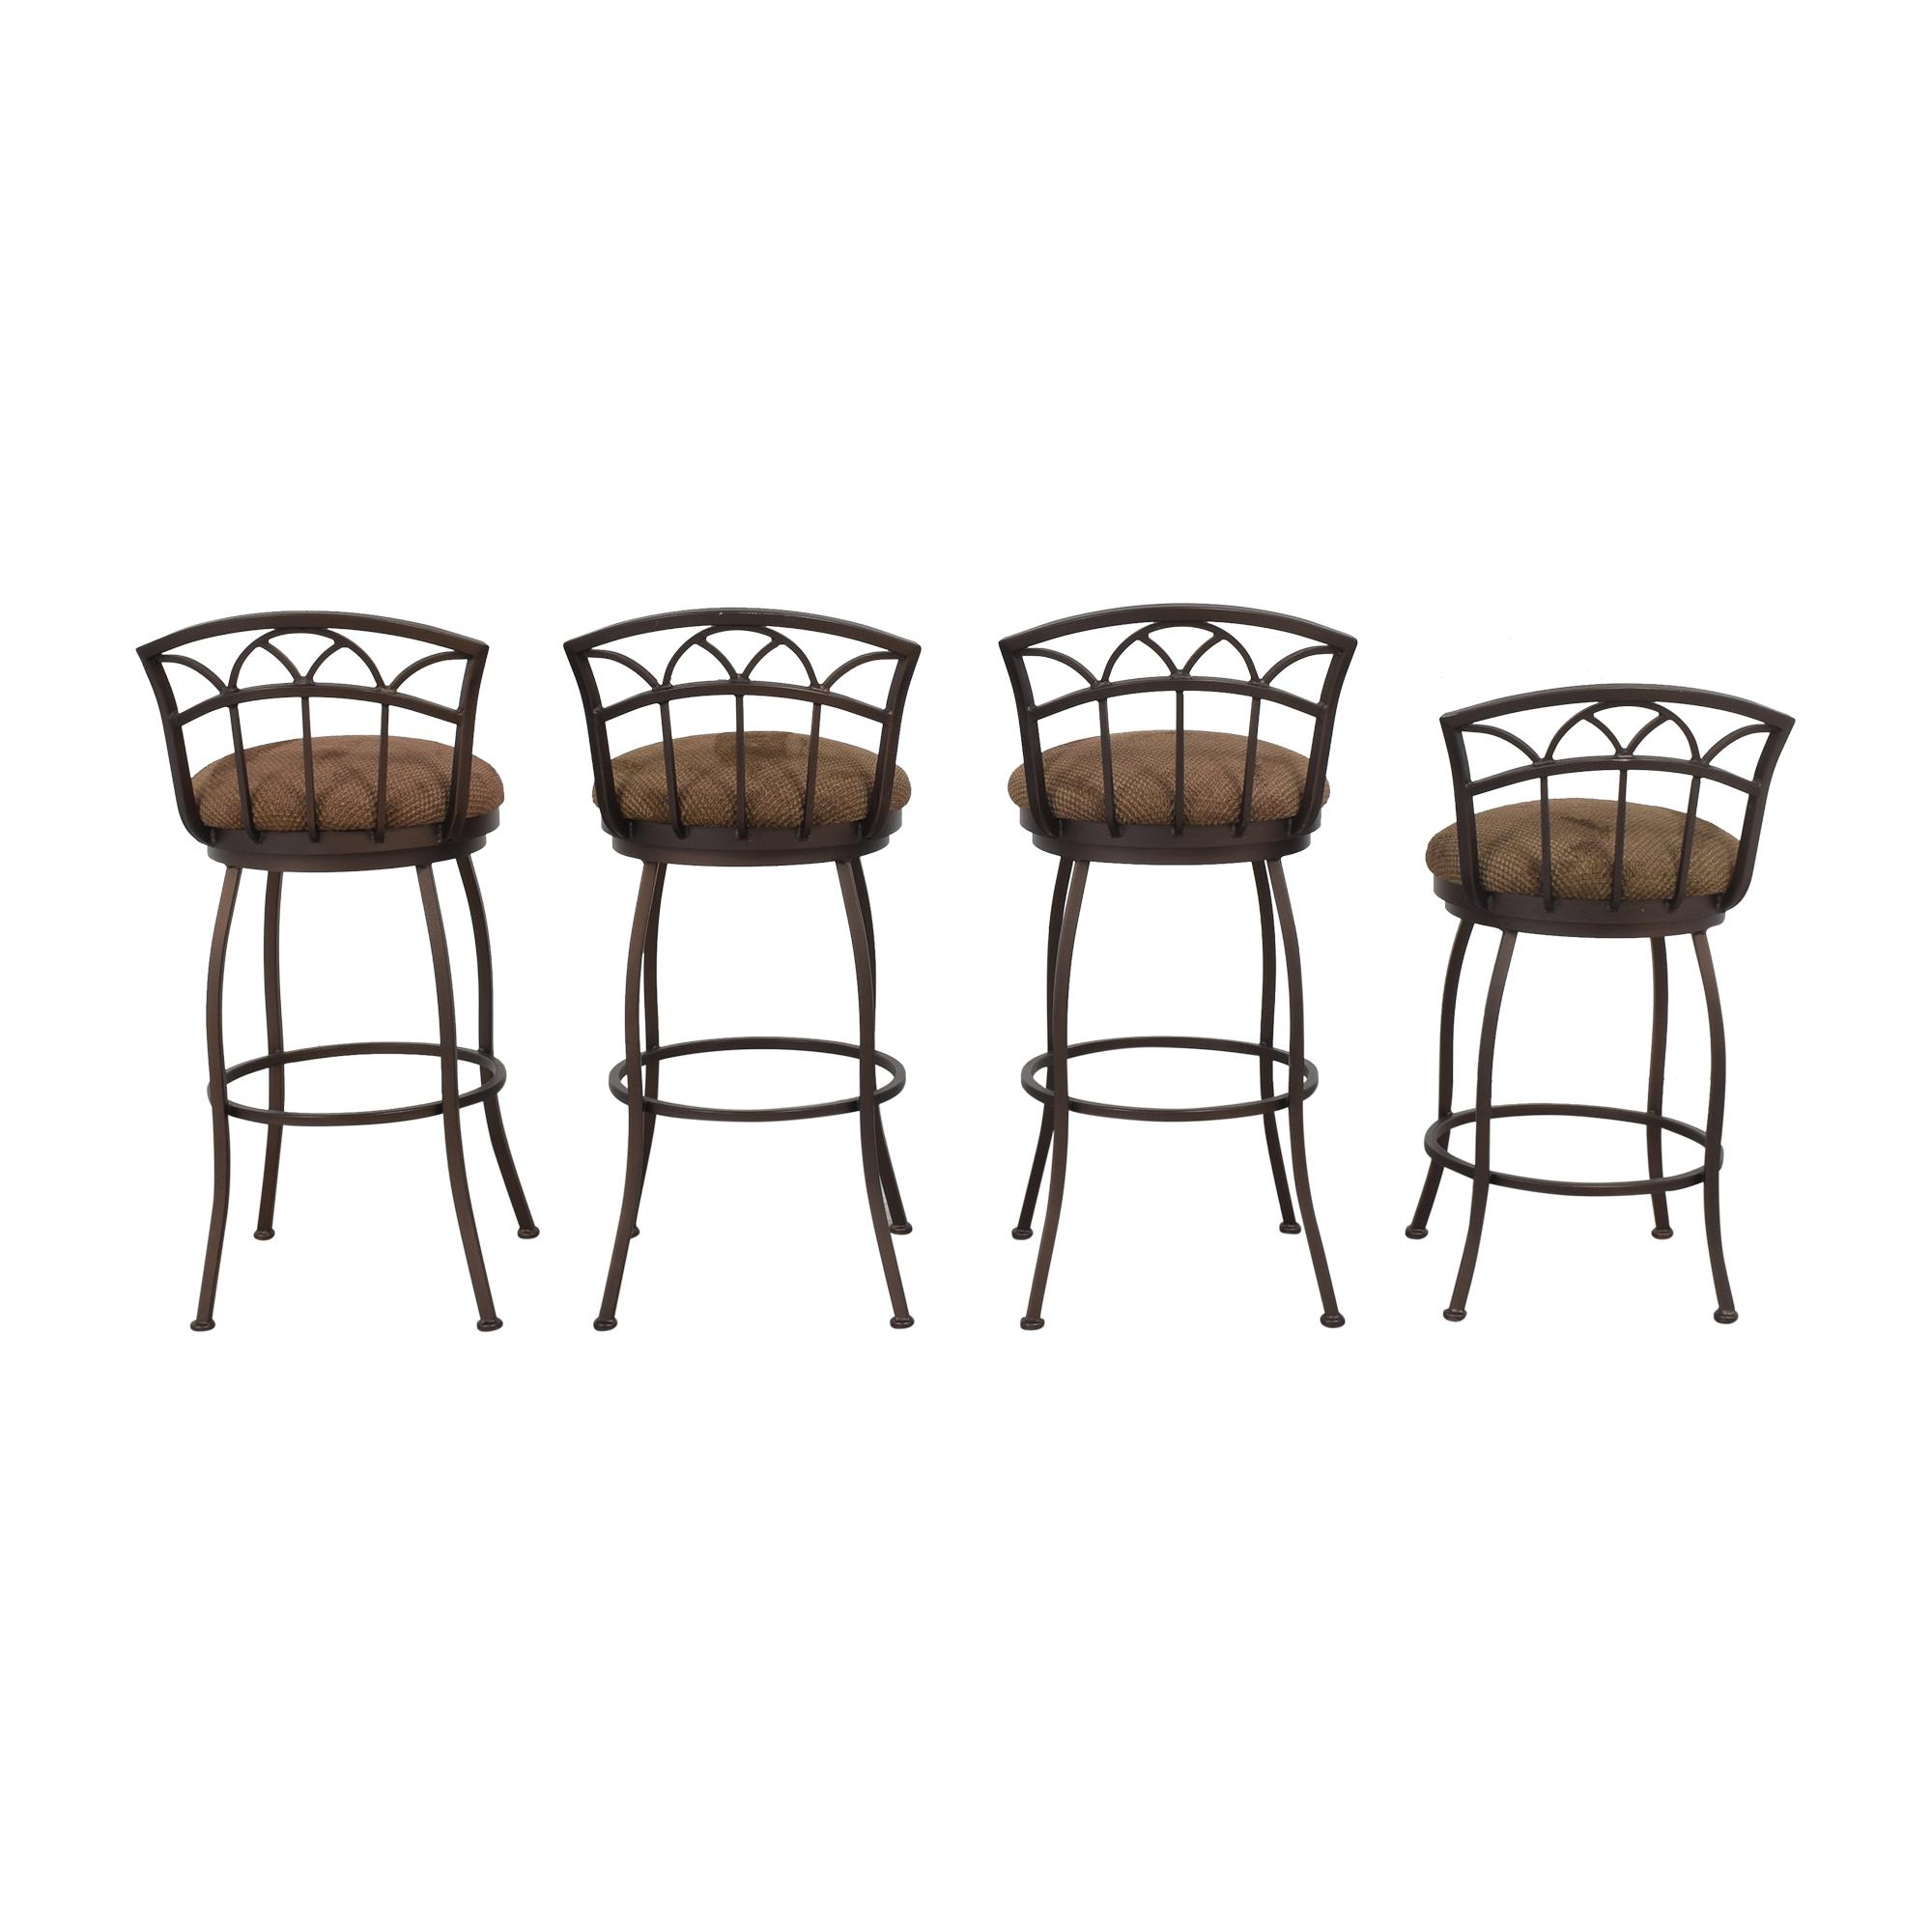 Tempo Furniture Tempo Frolic Bar Stools on sale